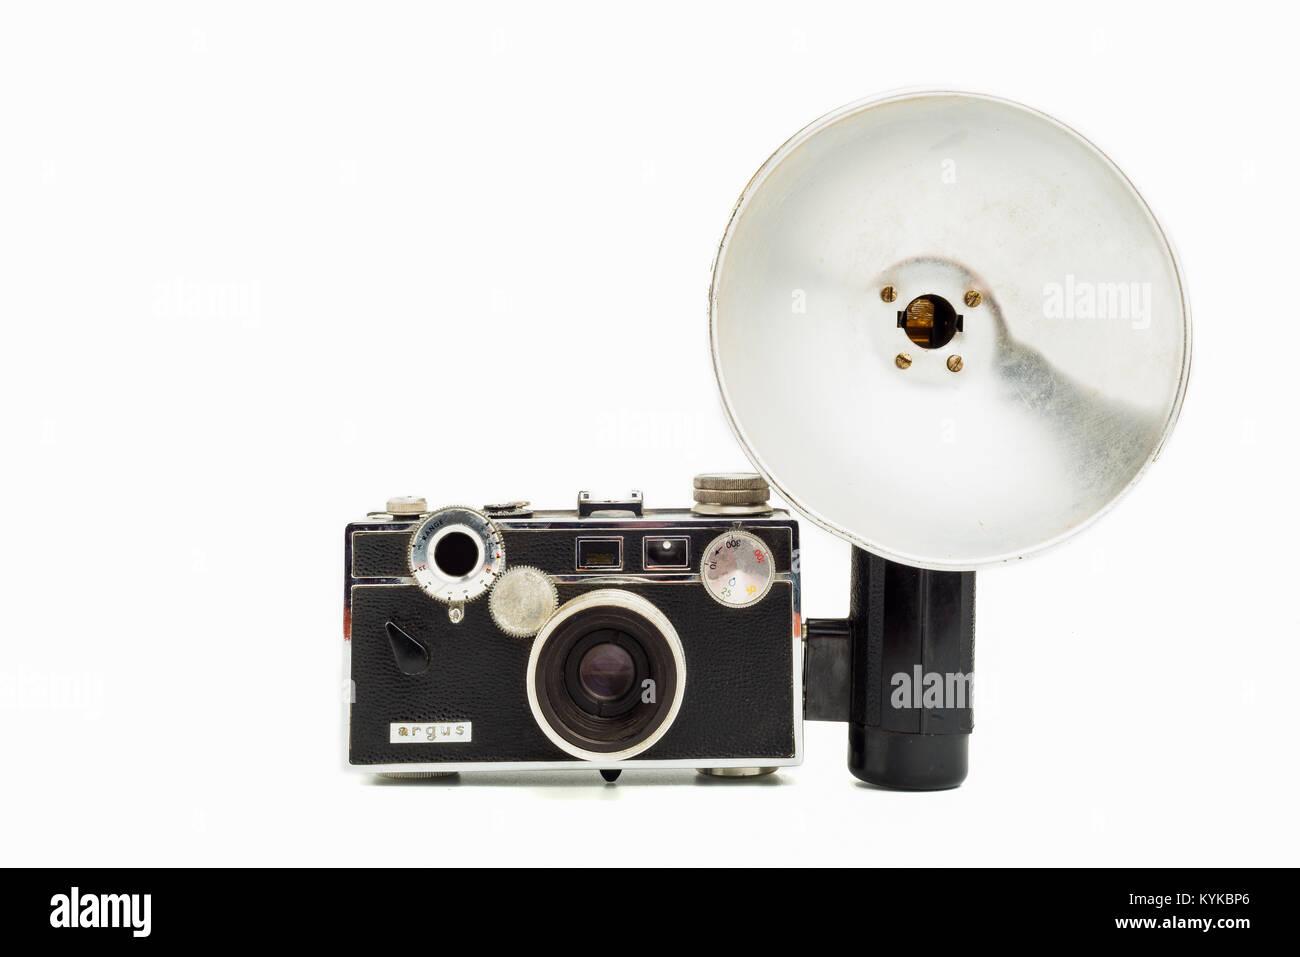 Argus C3, 35mm film camera wit flash on white background - Stock Image